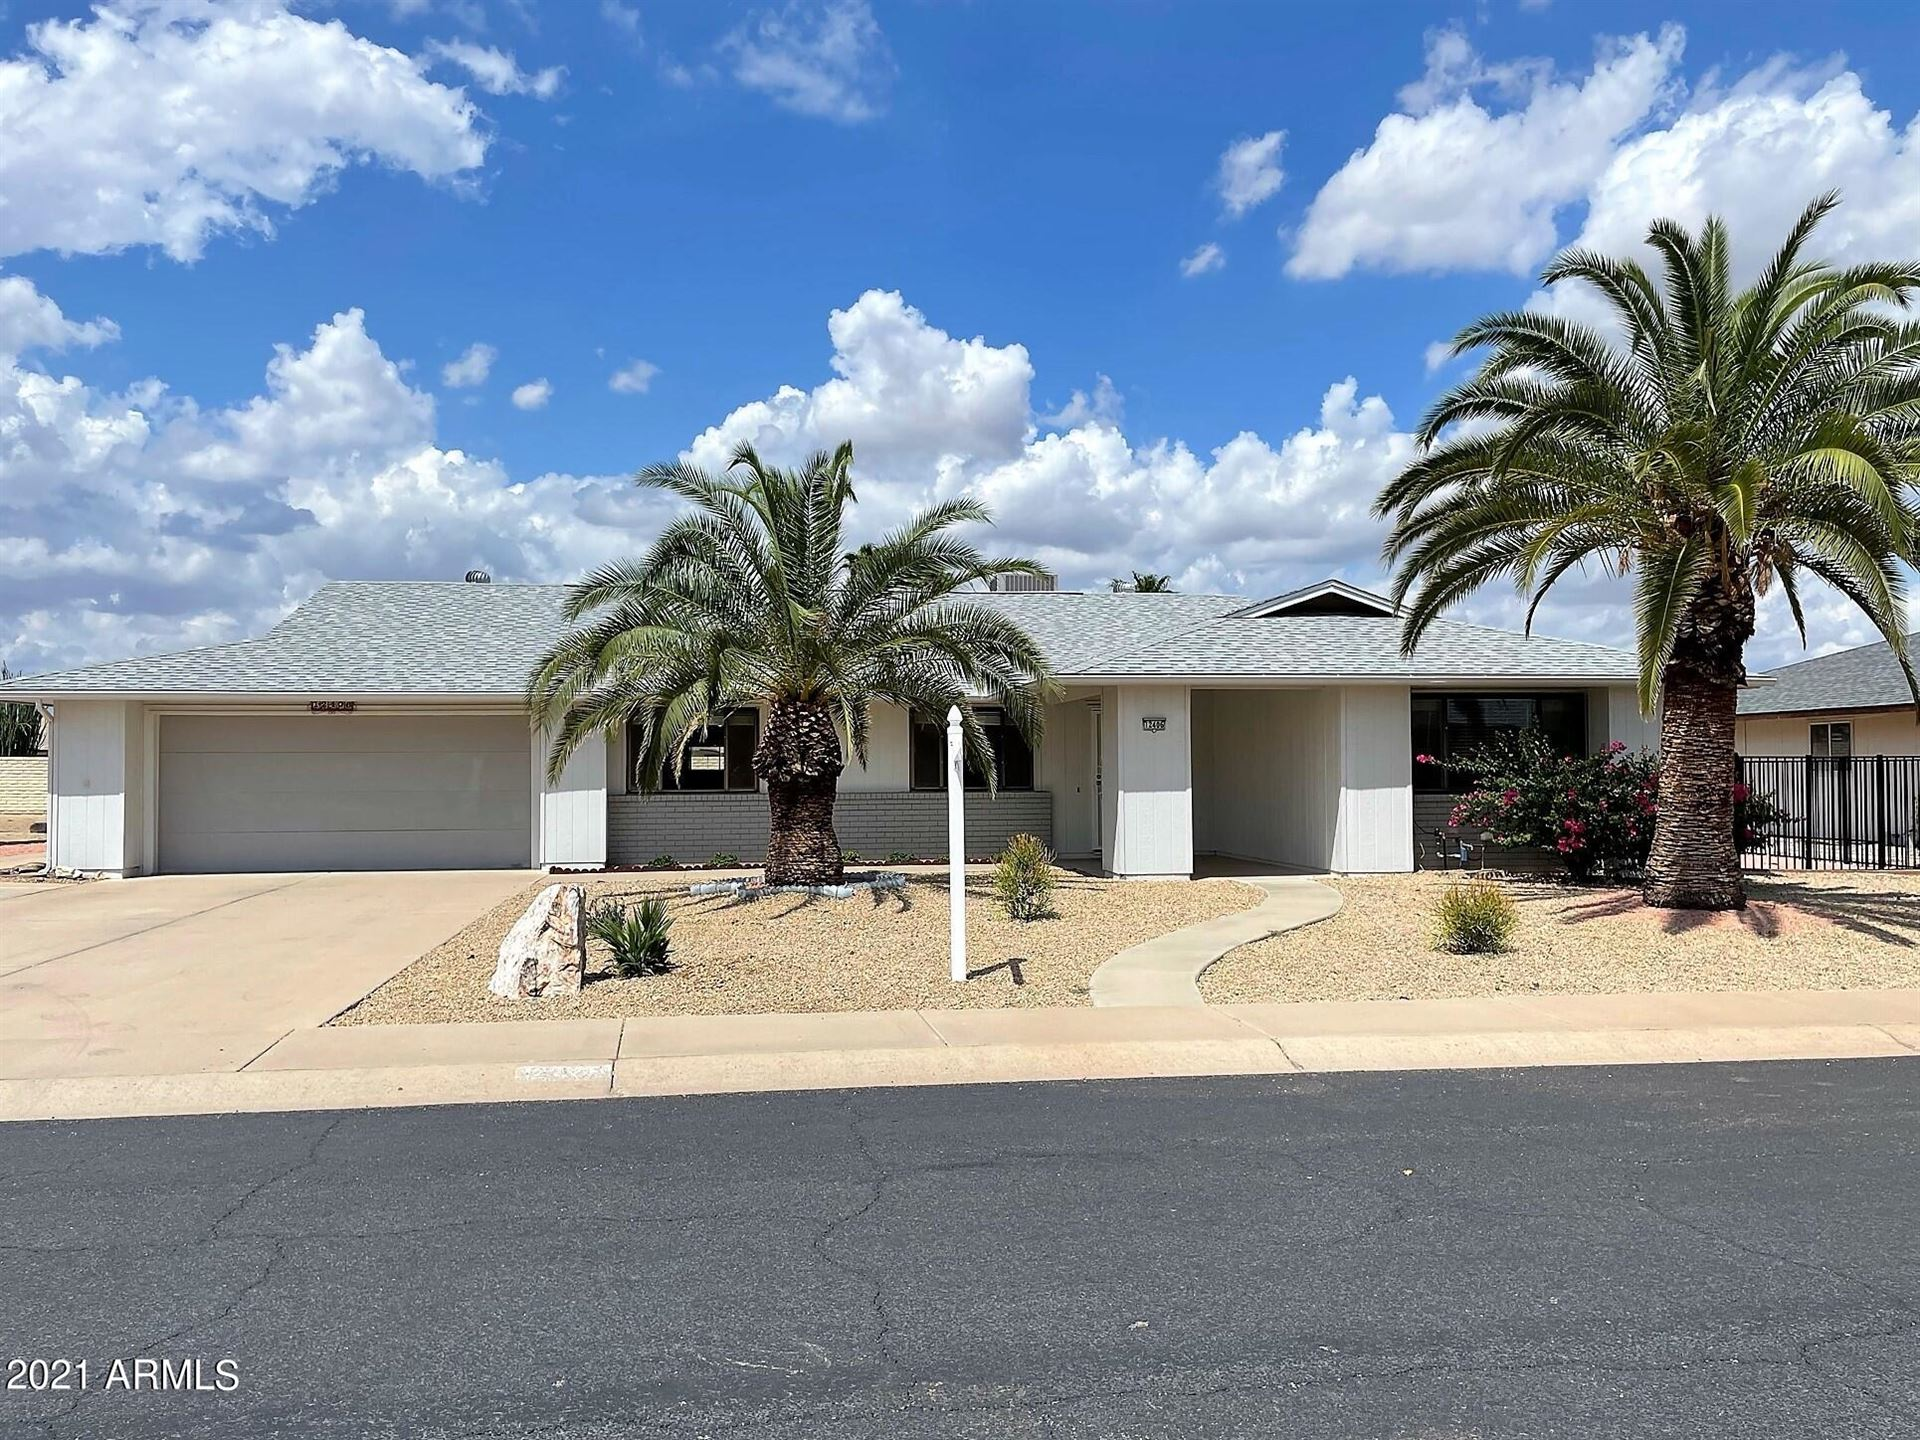 12406 W ALLEGRO Drive, Sun City West, AZ 85375 - MLS#: 6287727